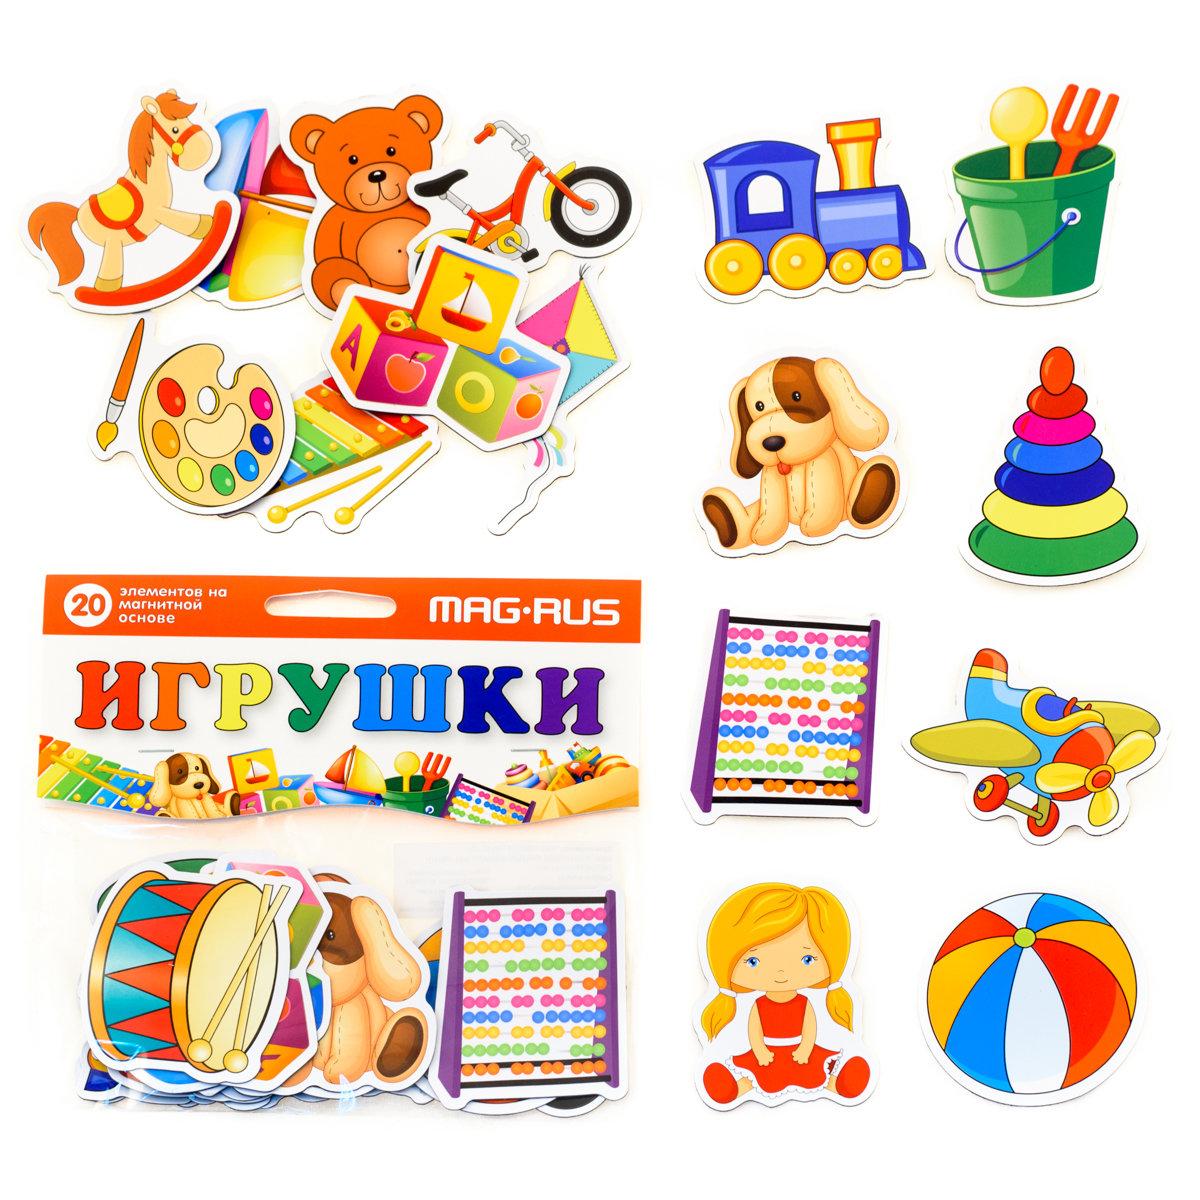 Картинки игрушек с названиями